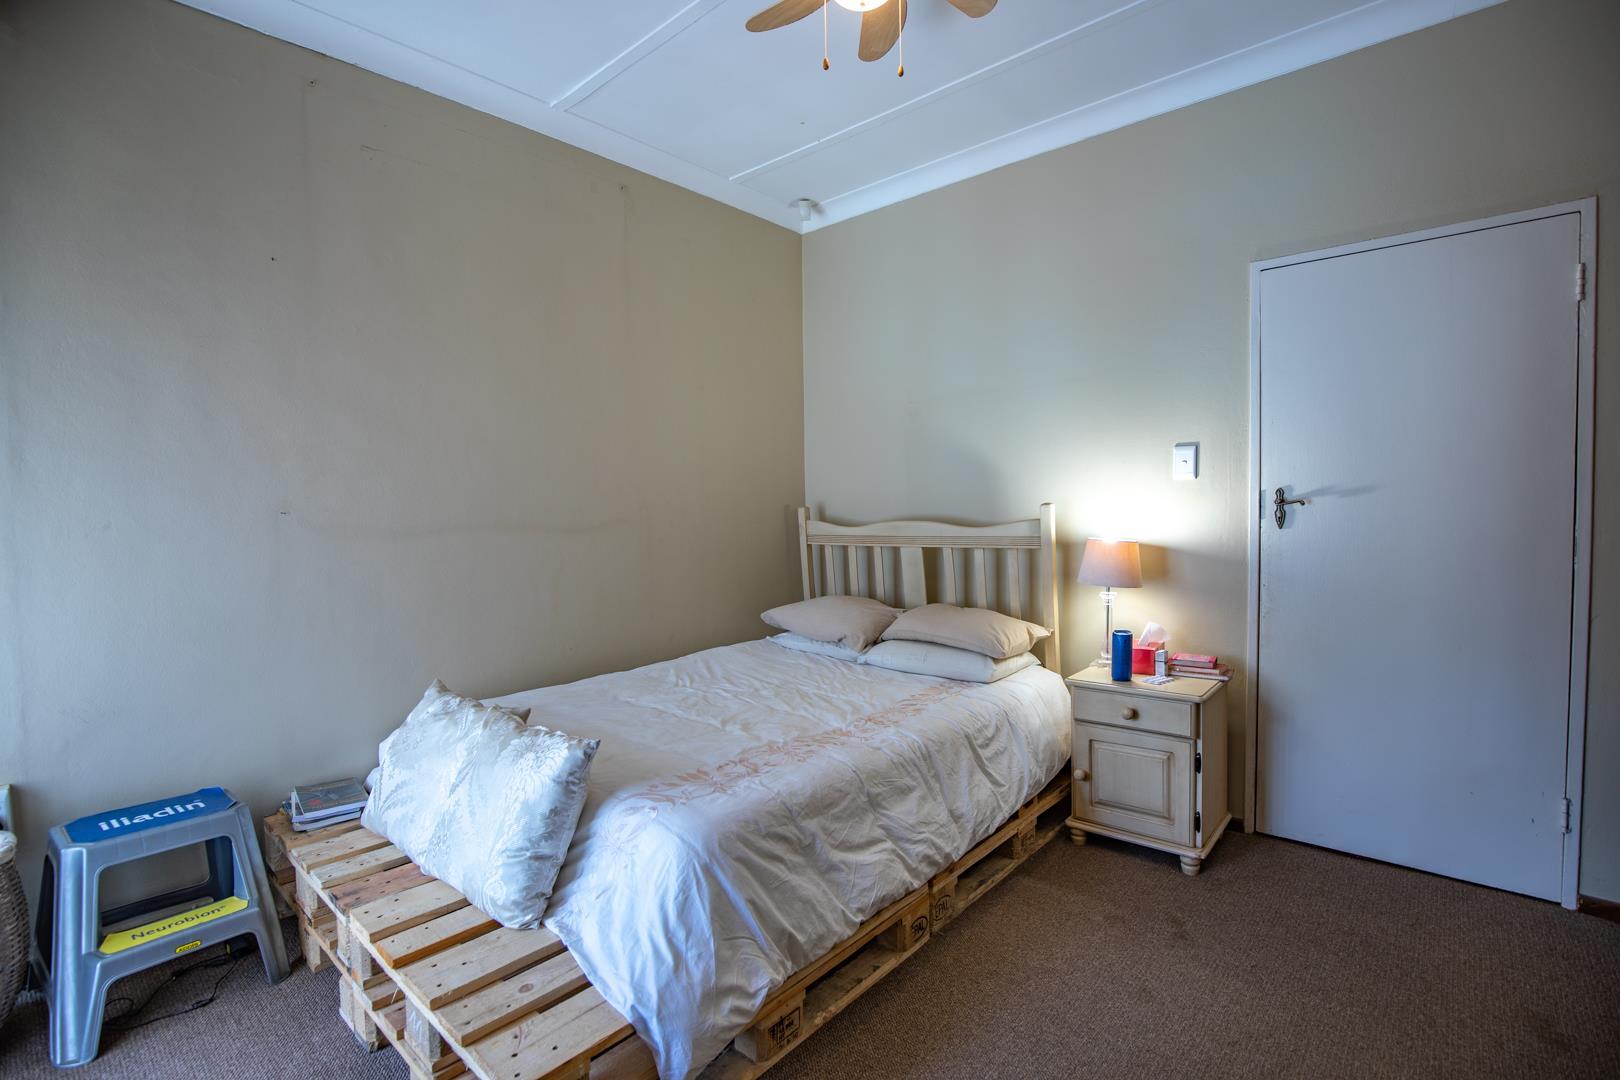 7 Bedroom House For Sale in Lynnwood